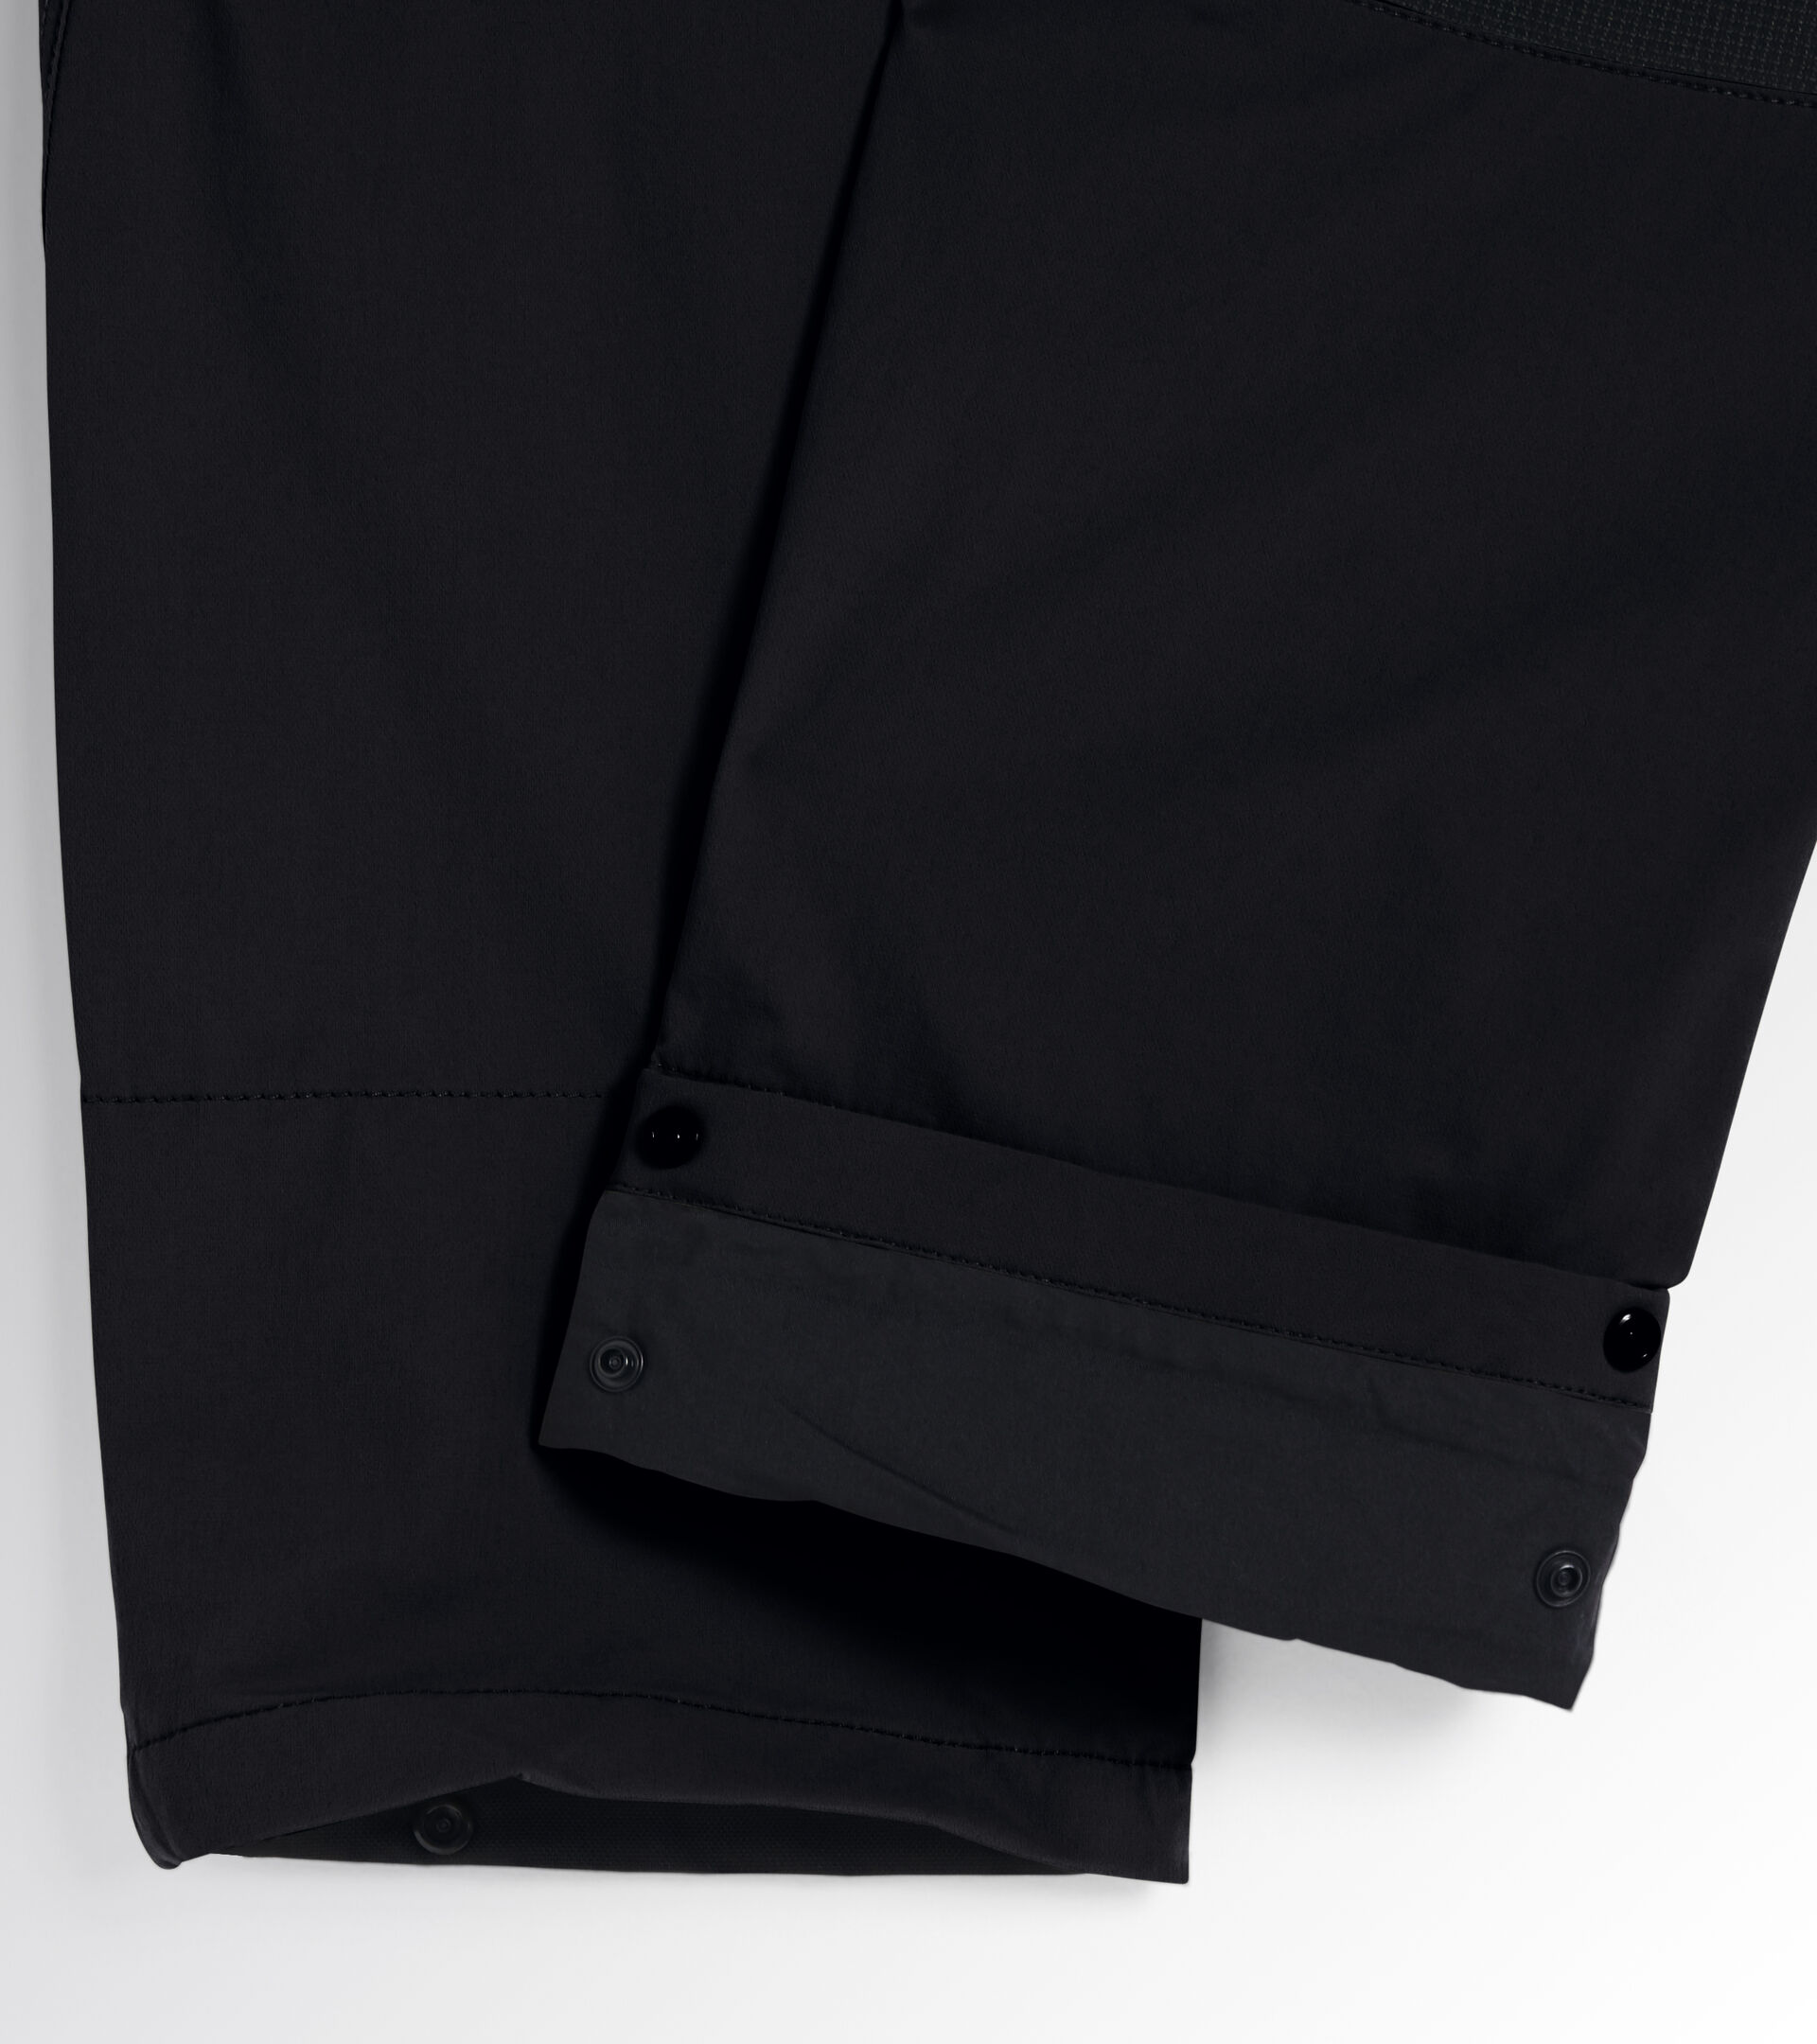 Apparel Utility UOMO PANT TECH PERFORMANCE BLACK Utility